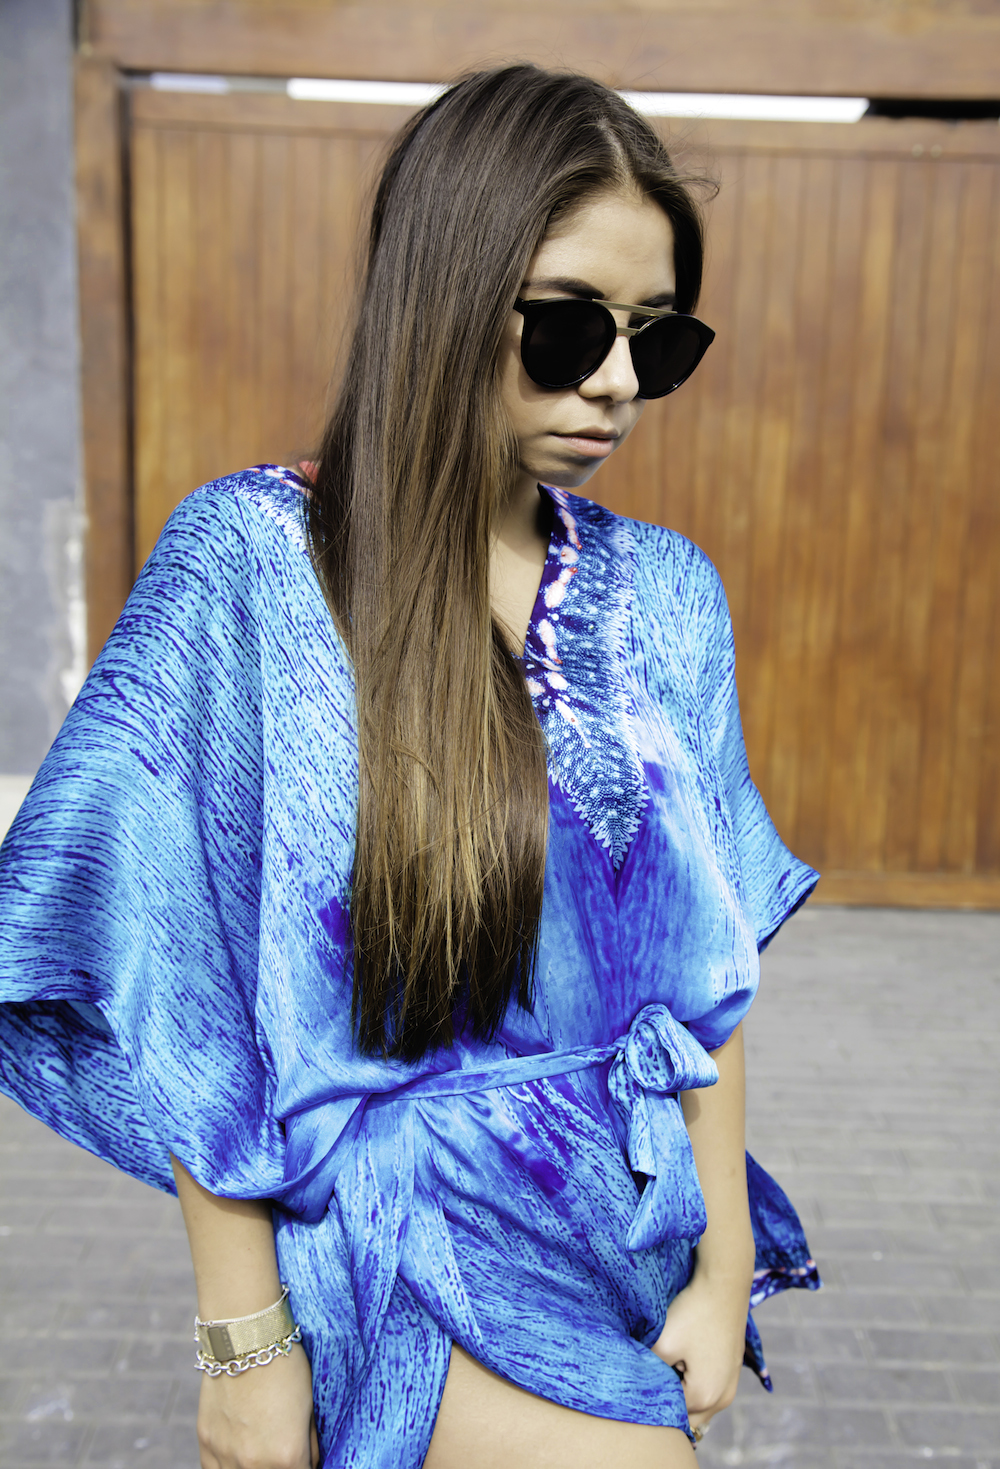 Fashionrella verano noemii resortwear5